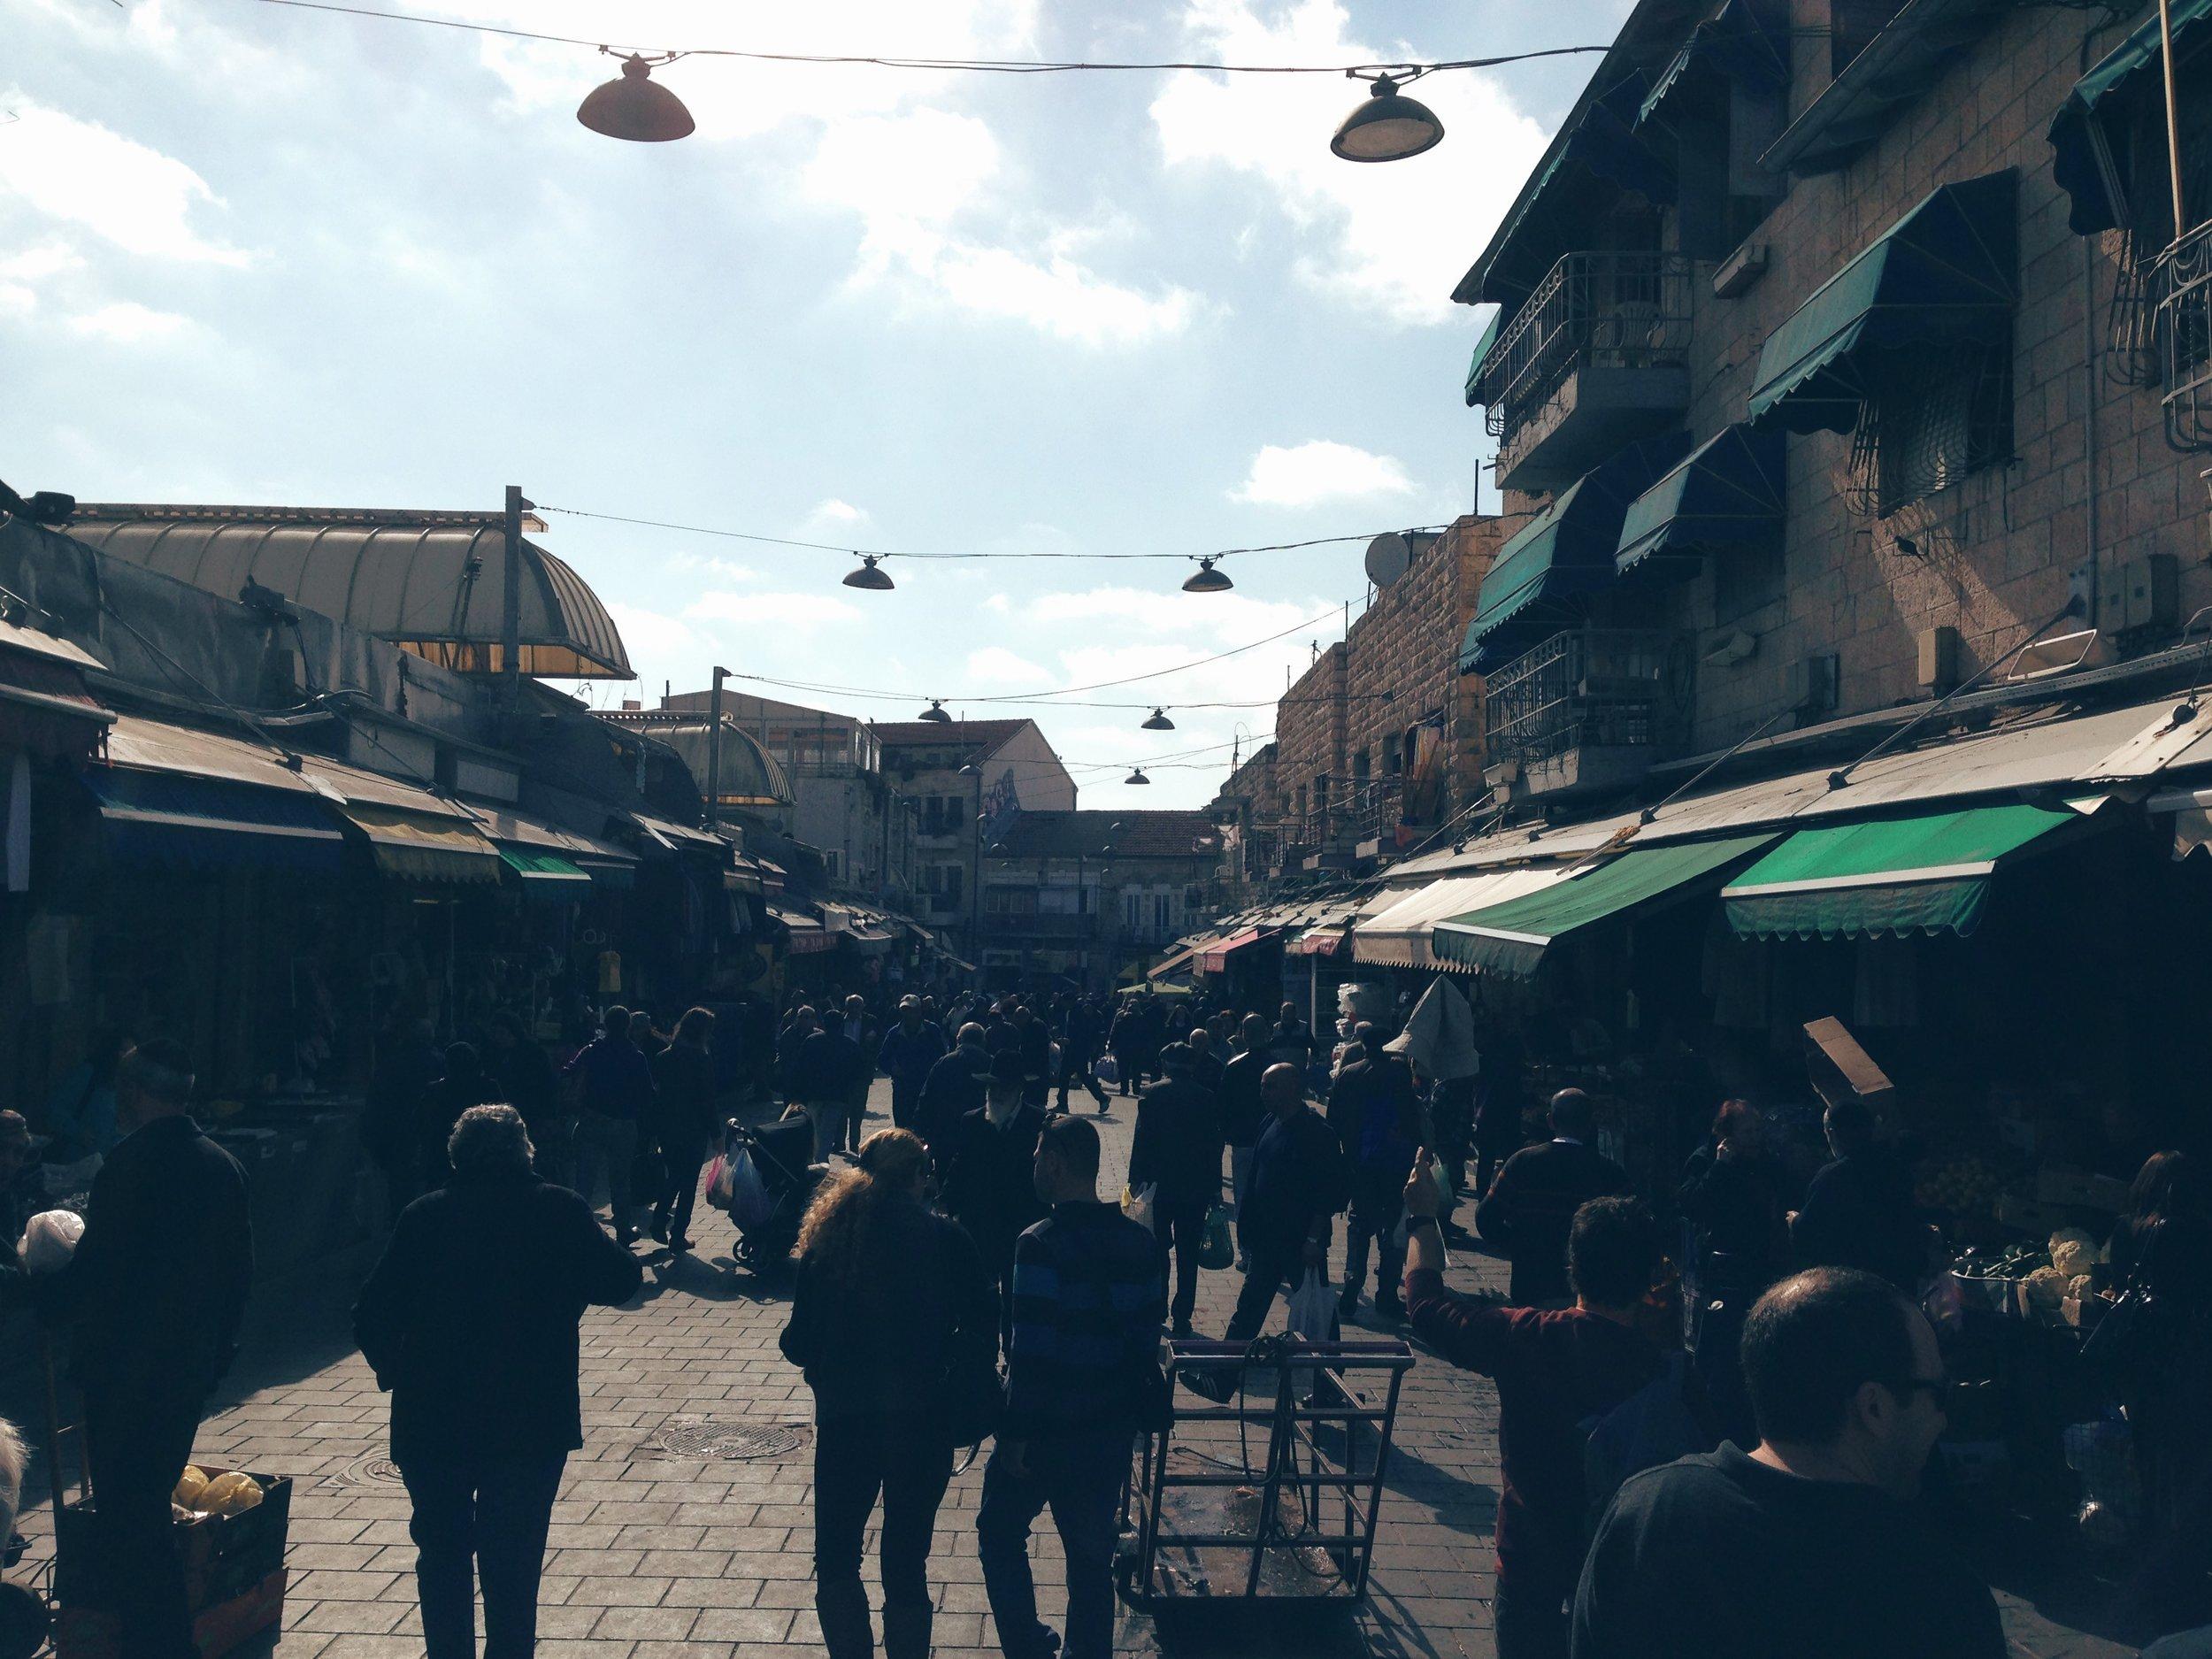 Mahane Yehuda food market in Jerusalem